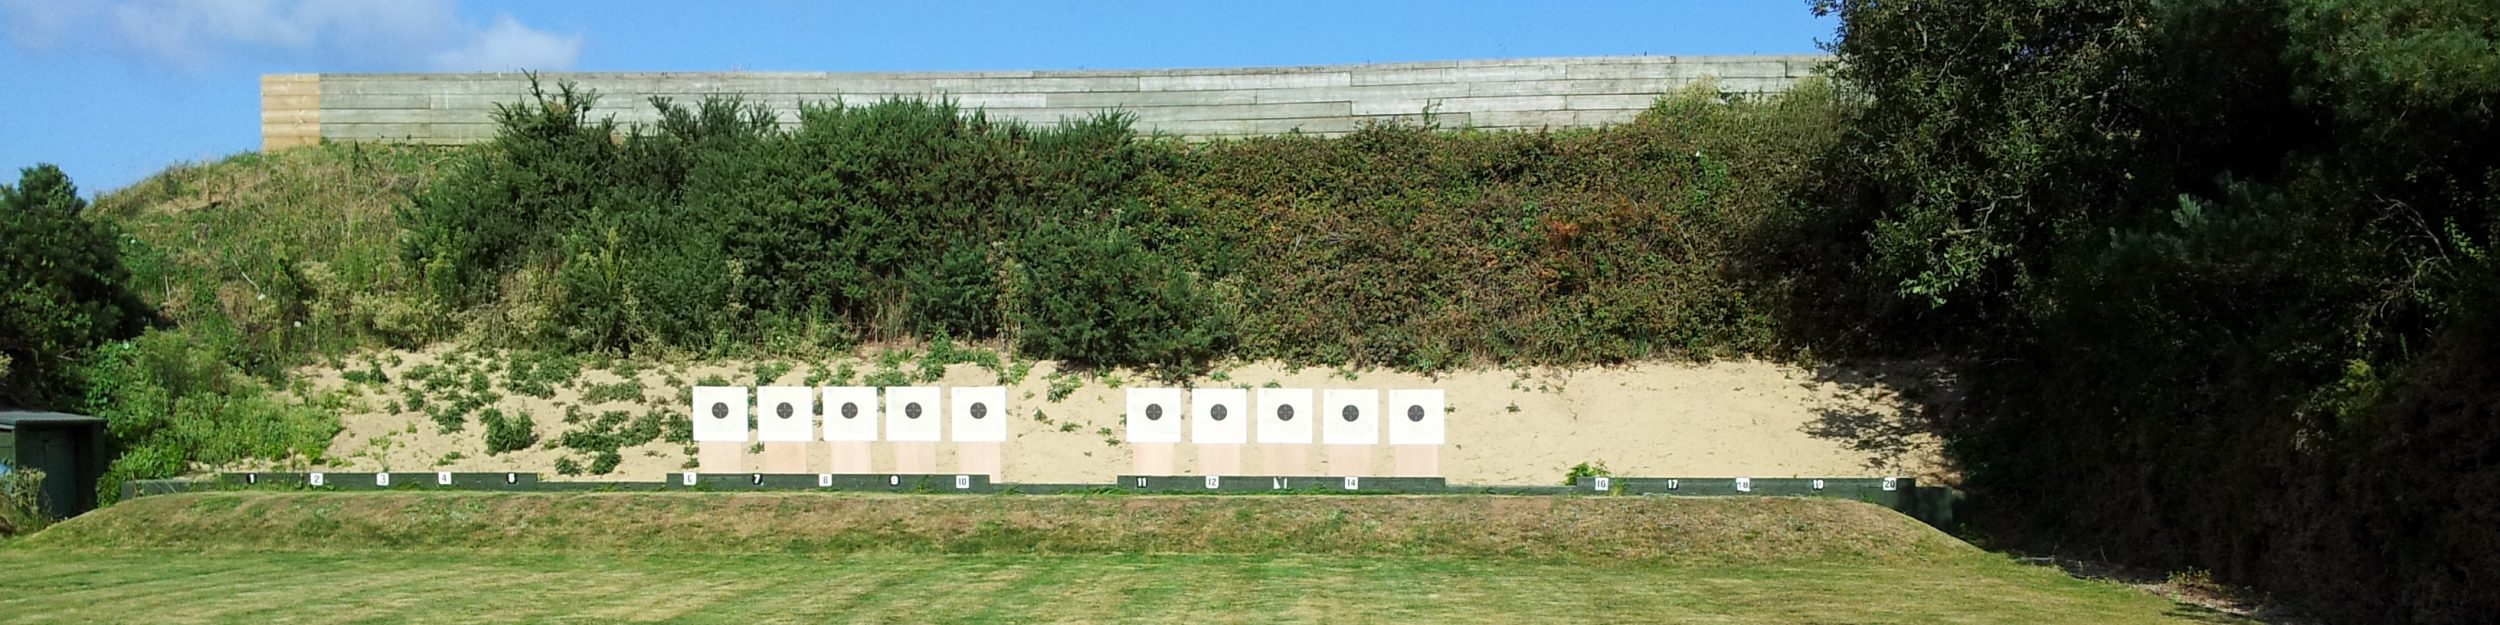 Jersey Pistol Club